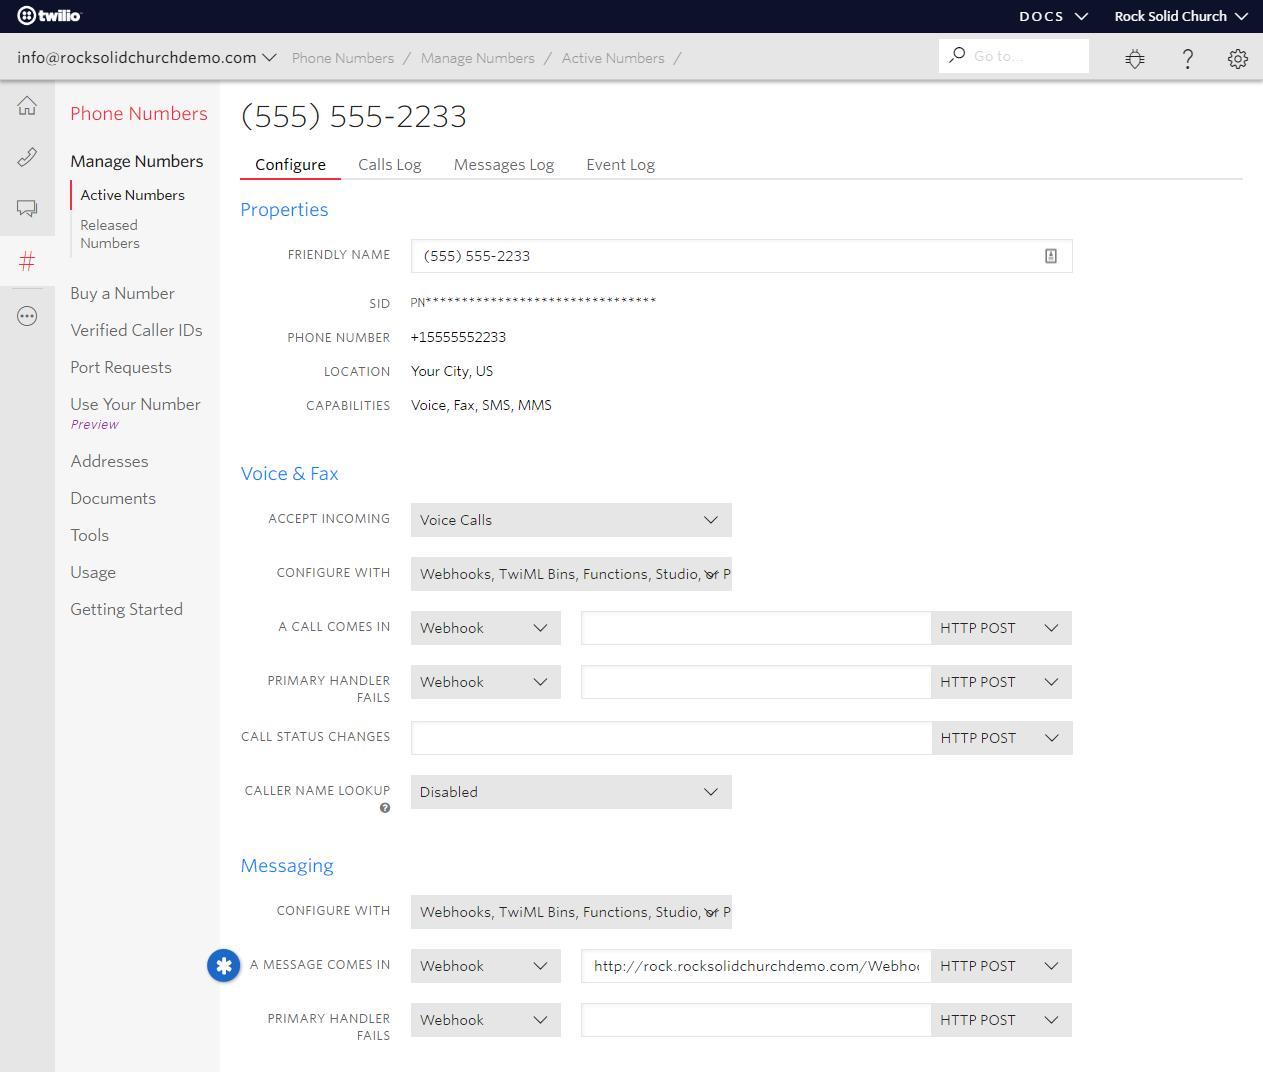 Configuring the Twilio Webhook